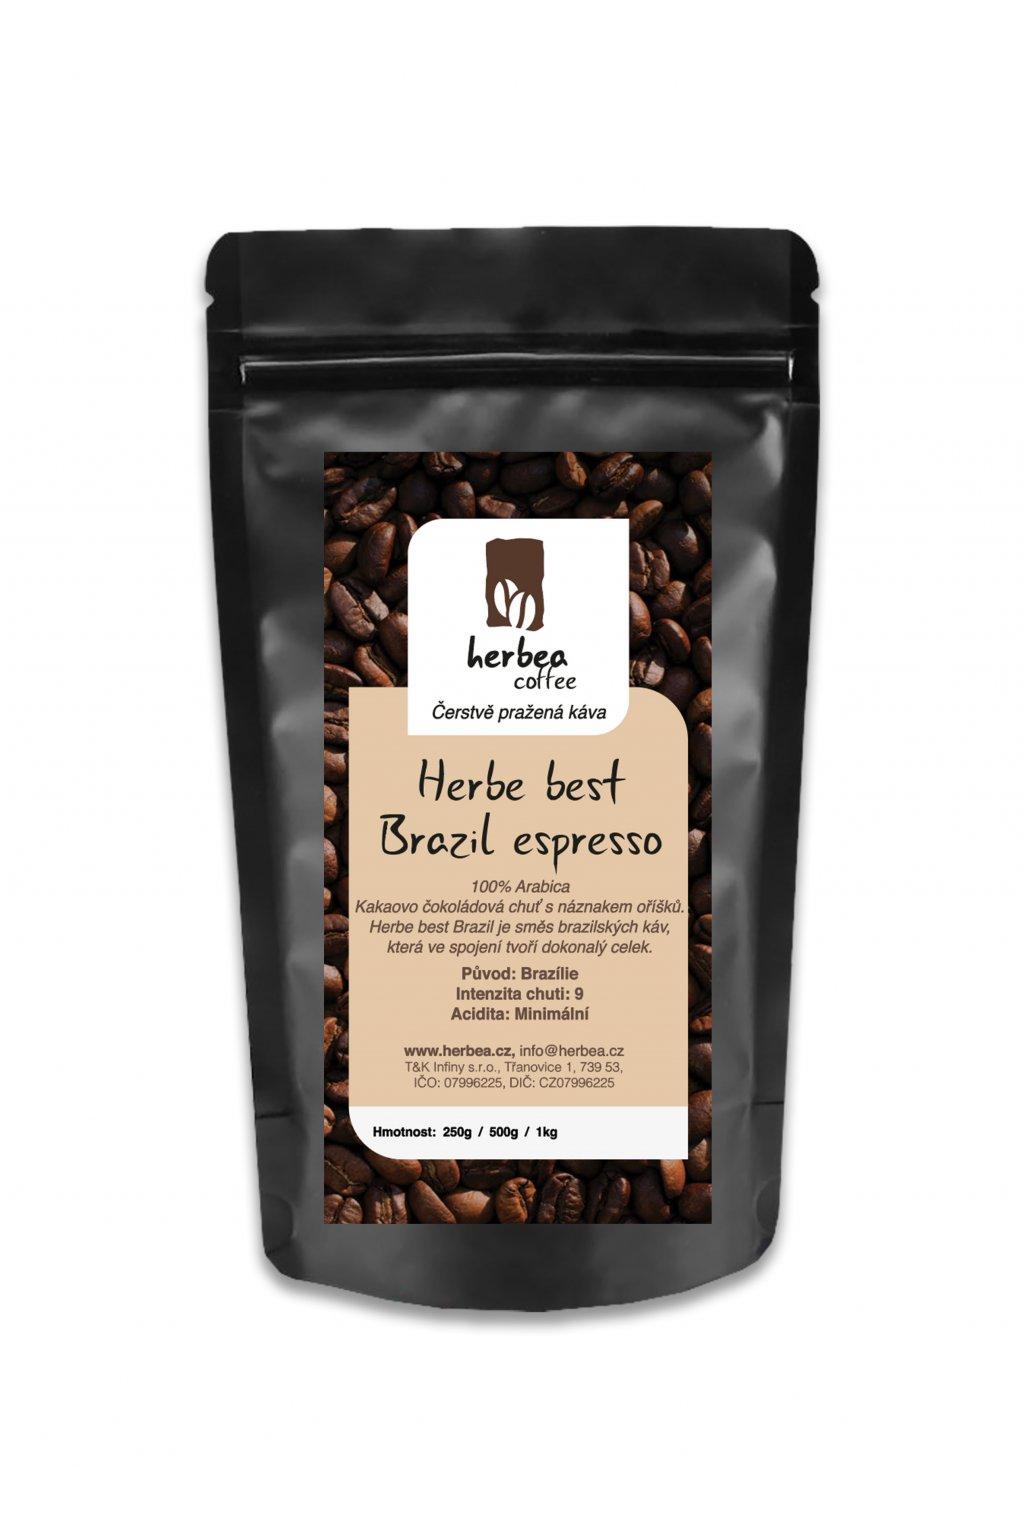 Herbe best Brazil espresso nahled